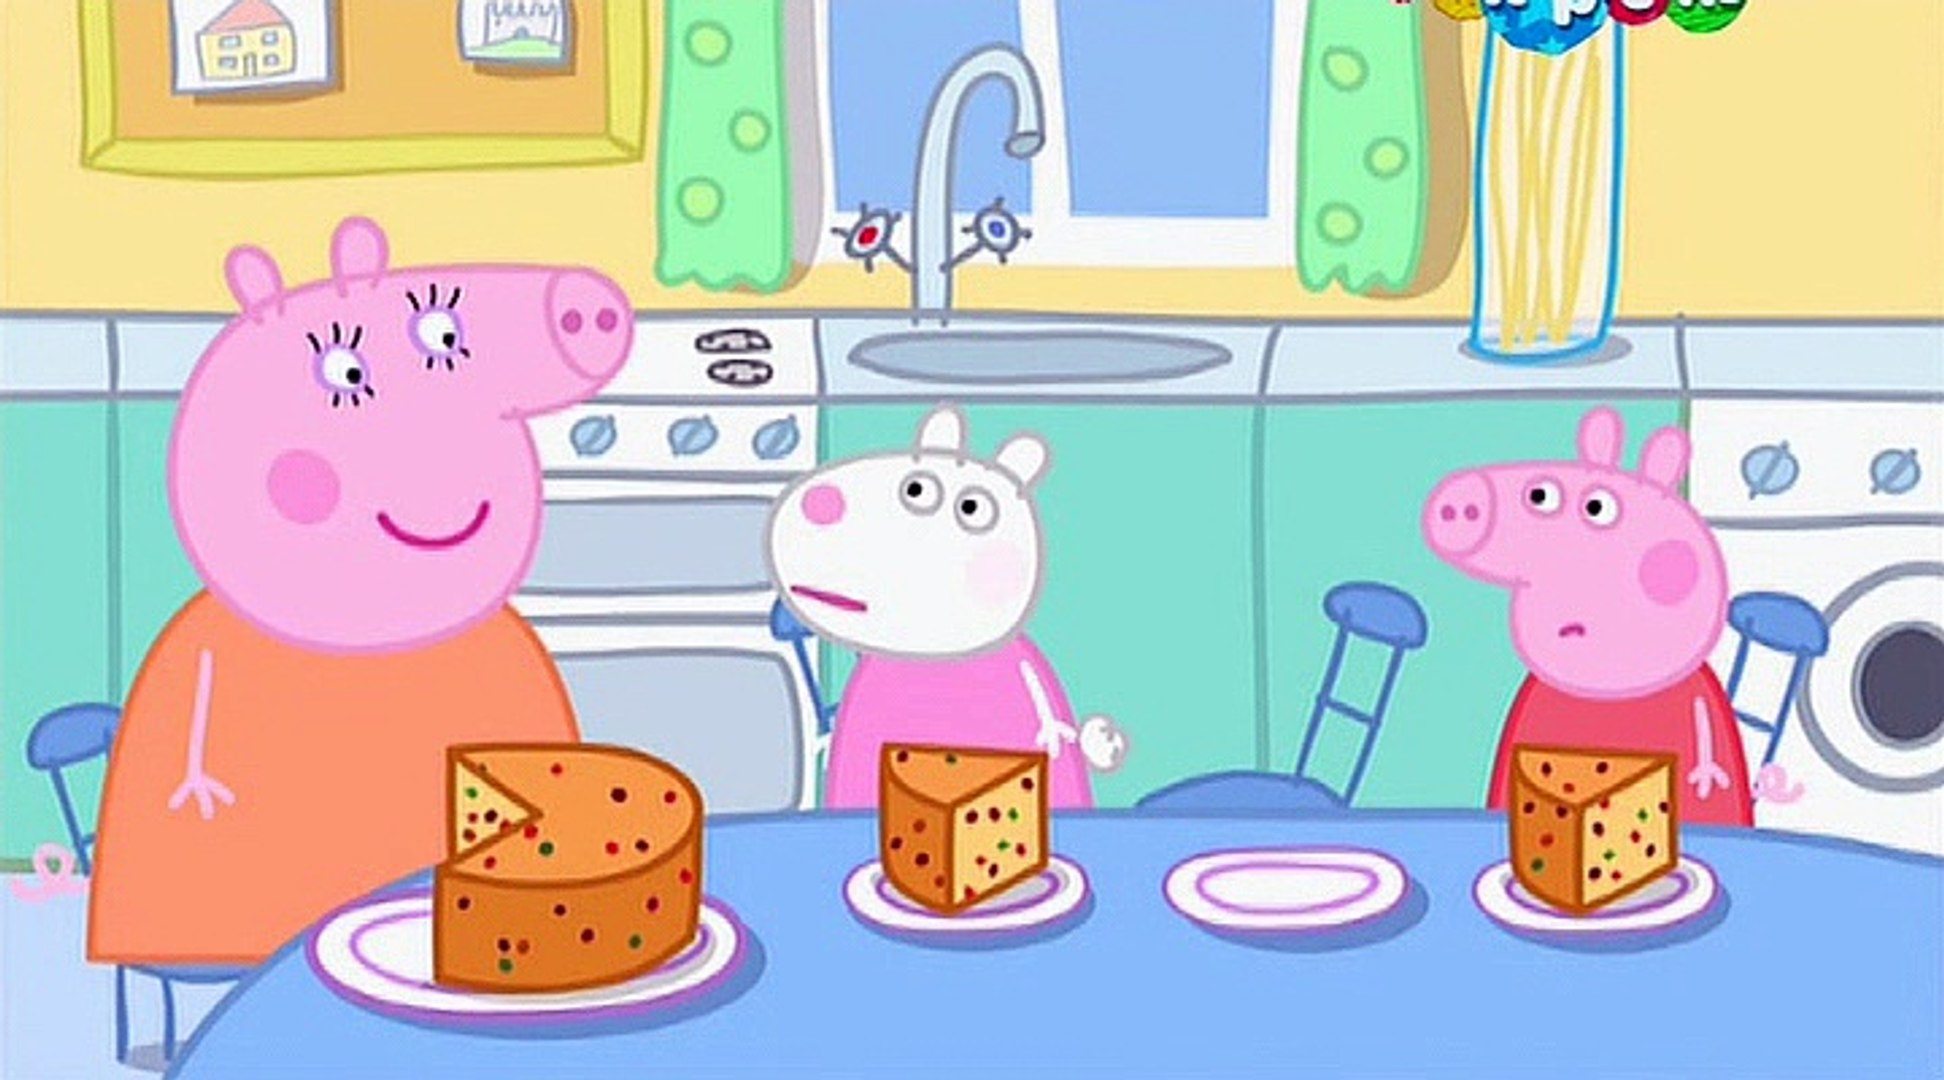 Свинка Пеппа- Часы с кукушкой- Cuckoo Clock -Все серии подряд Свинка Пеппа